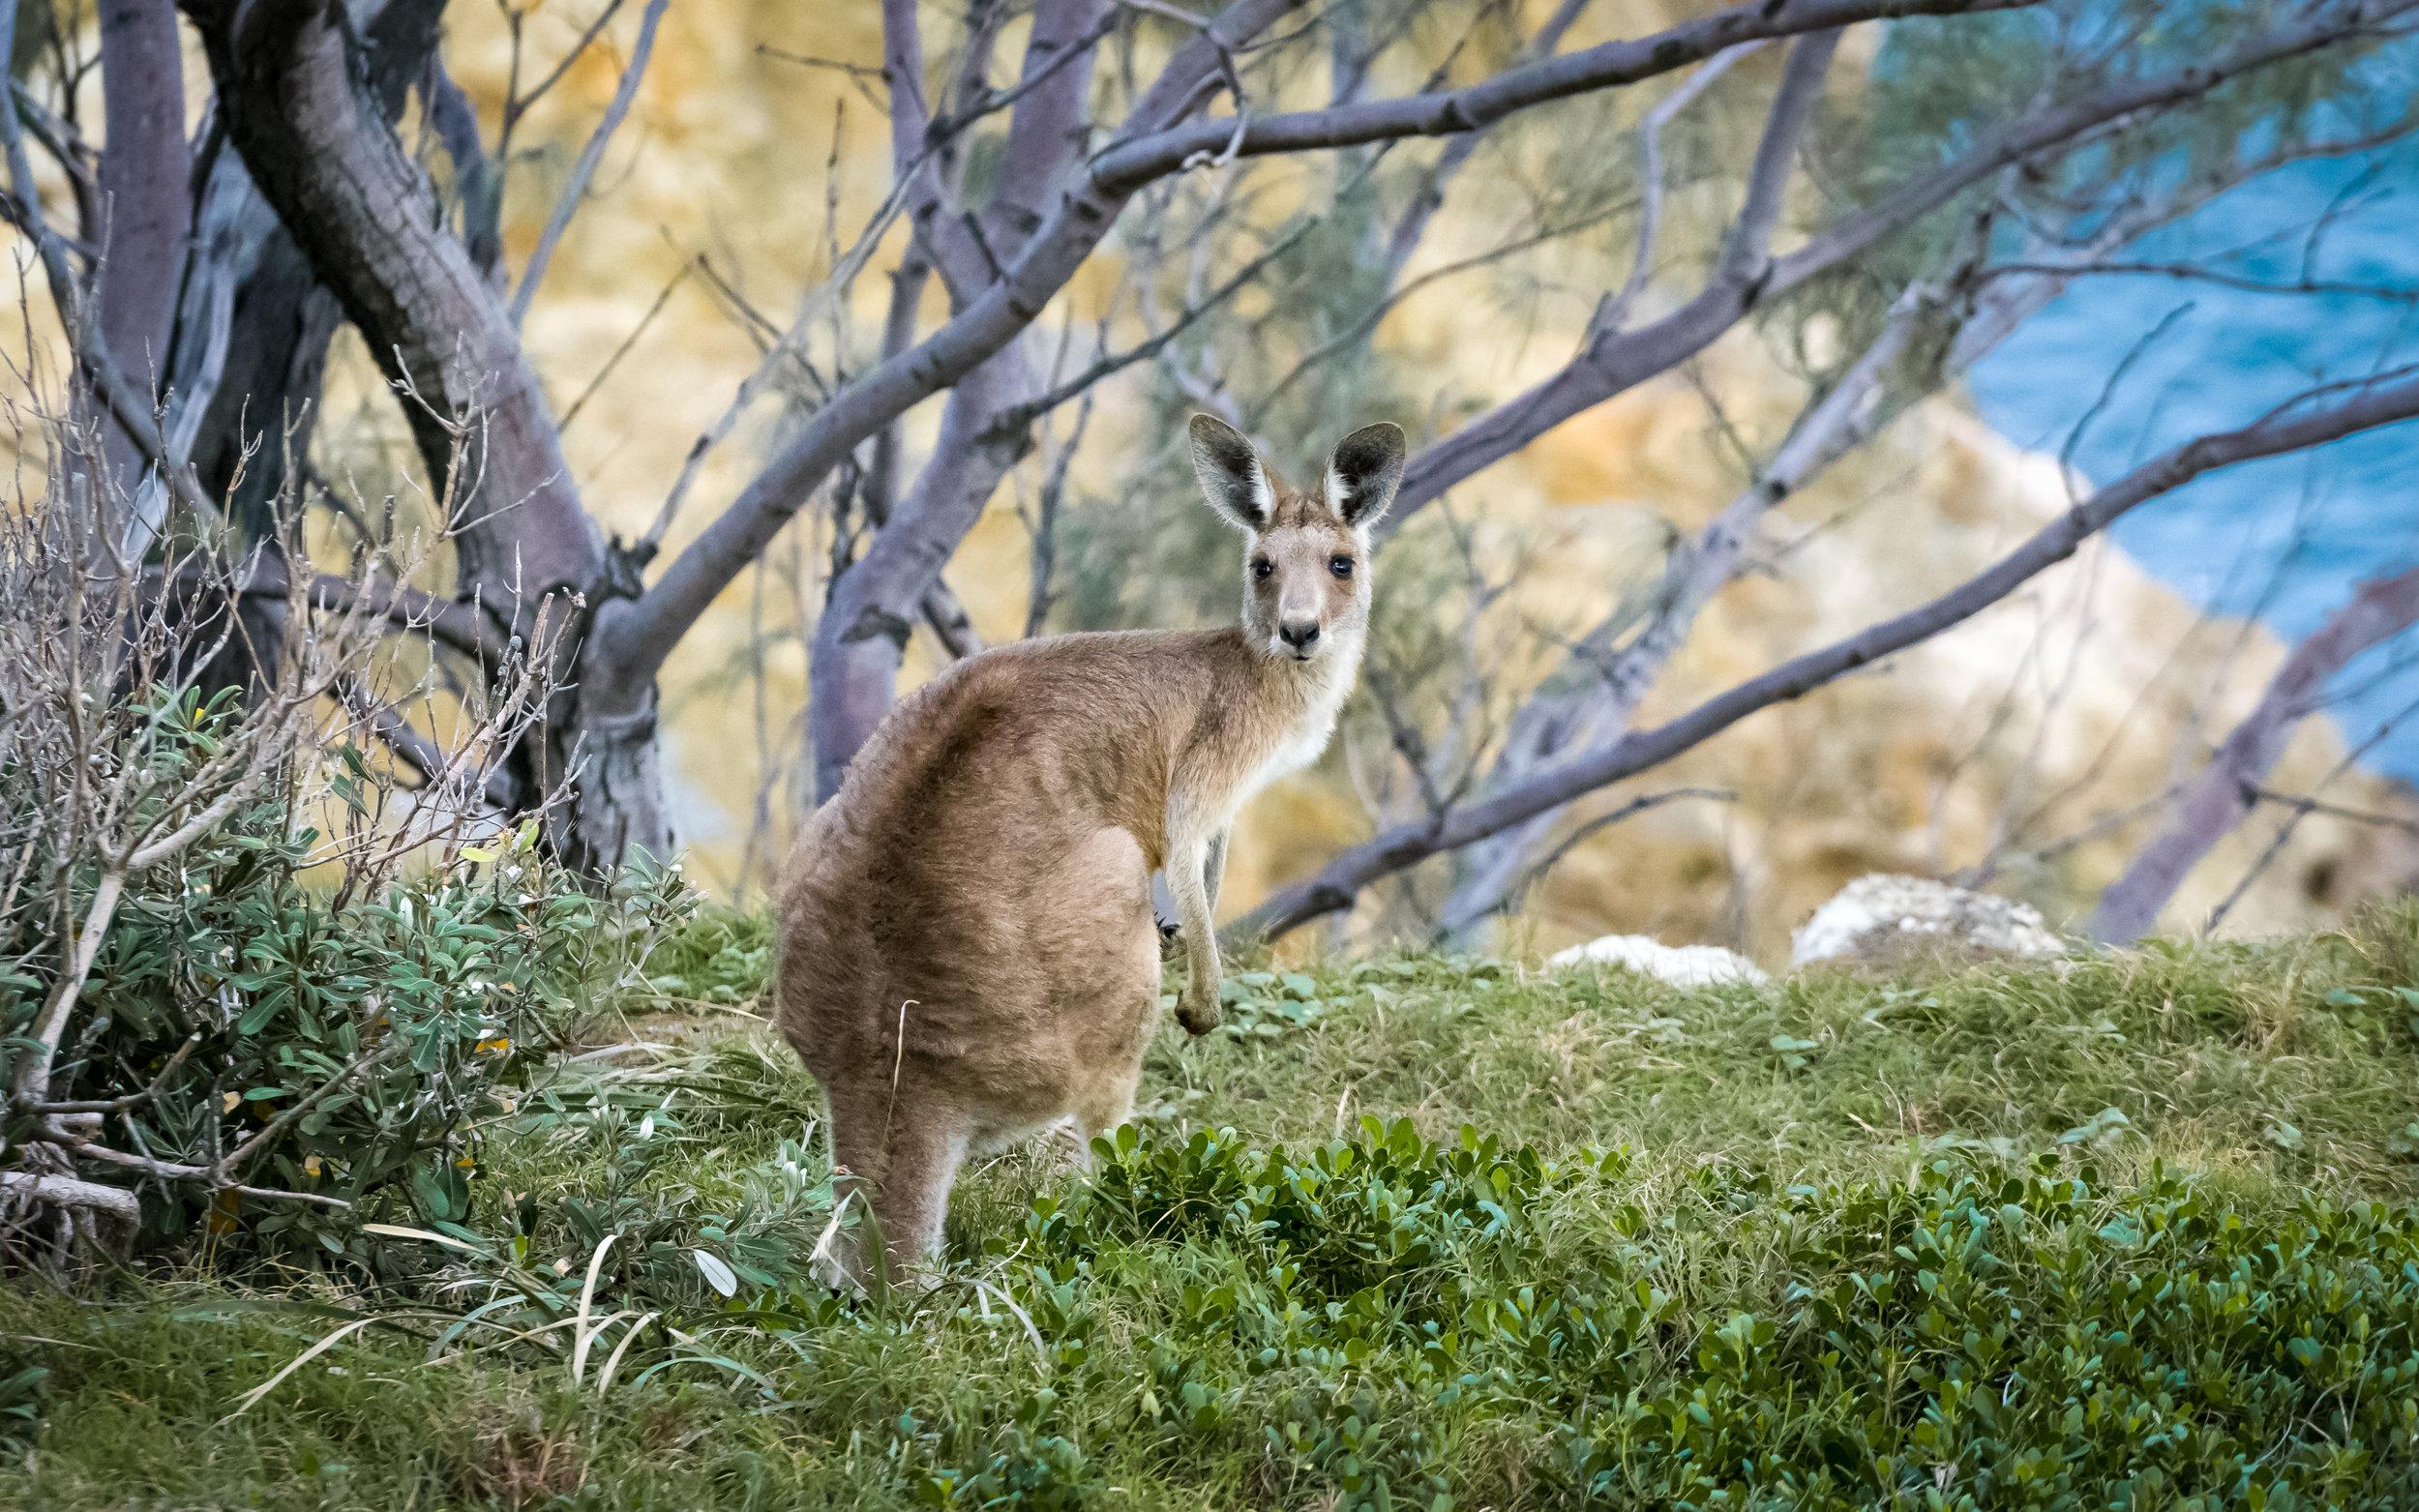 Grey Kangaroo on Stradbroke Island - A7RII in APS-C mode and FE70200F4 G OSS